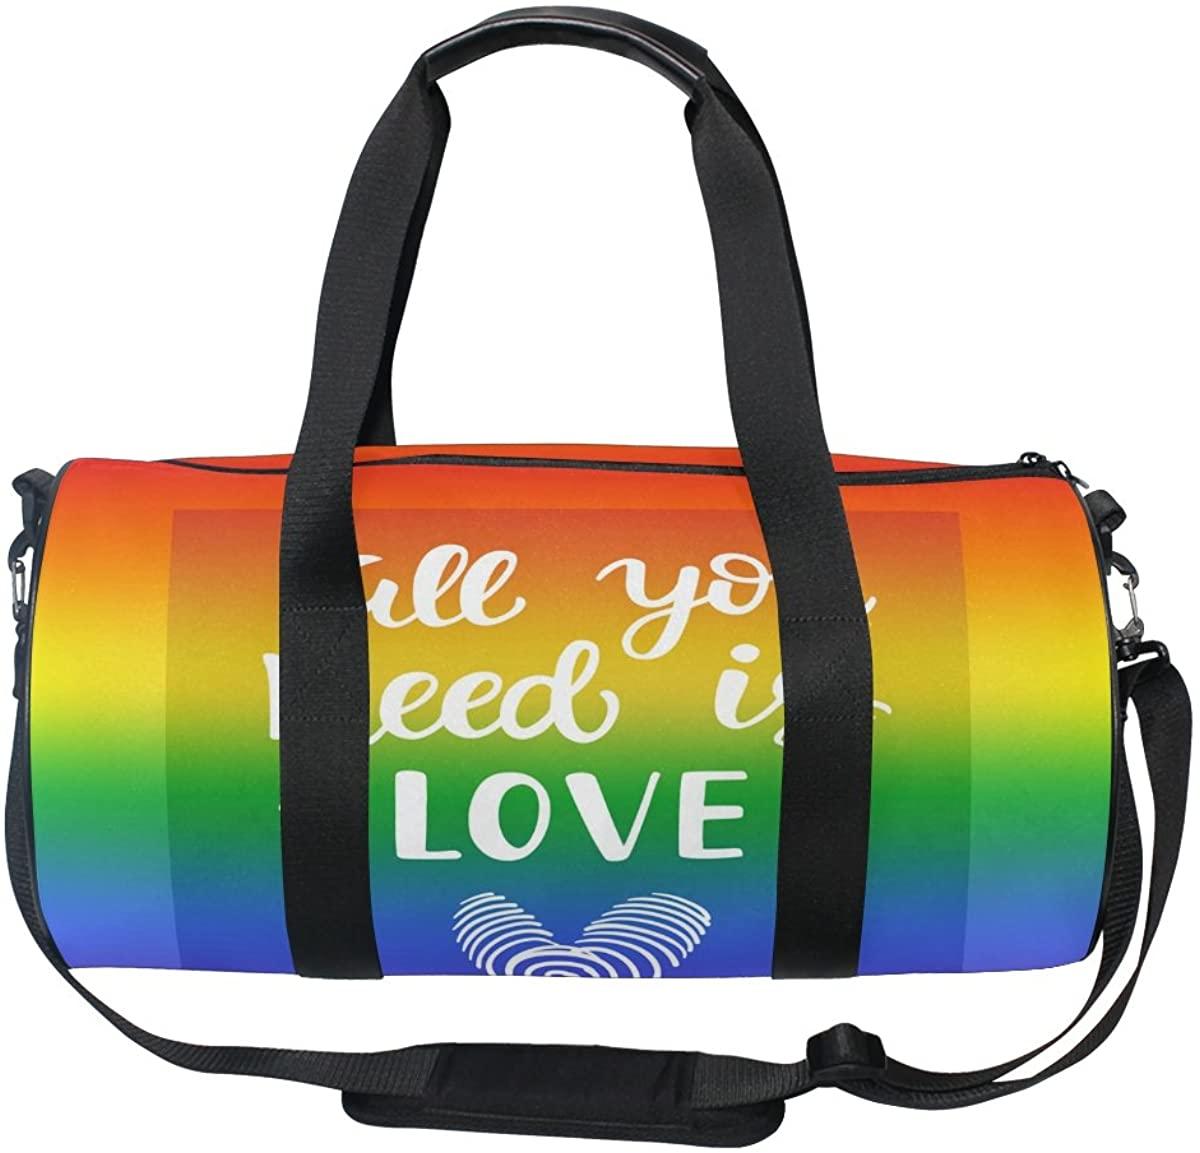 ALAZA Stylish Rainbow Quote Sports Gym Duffel Bag Travel Luggage Handbag for Men Women